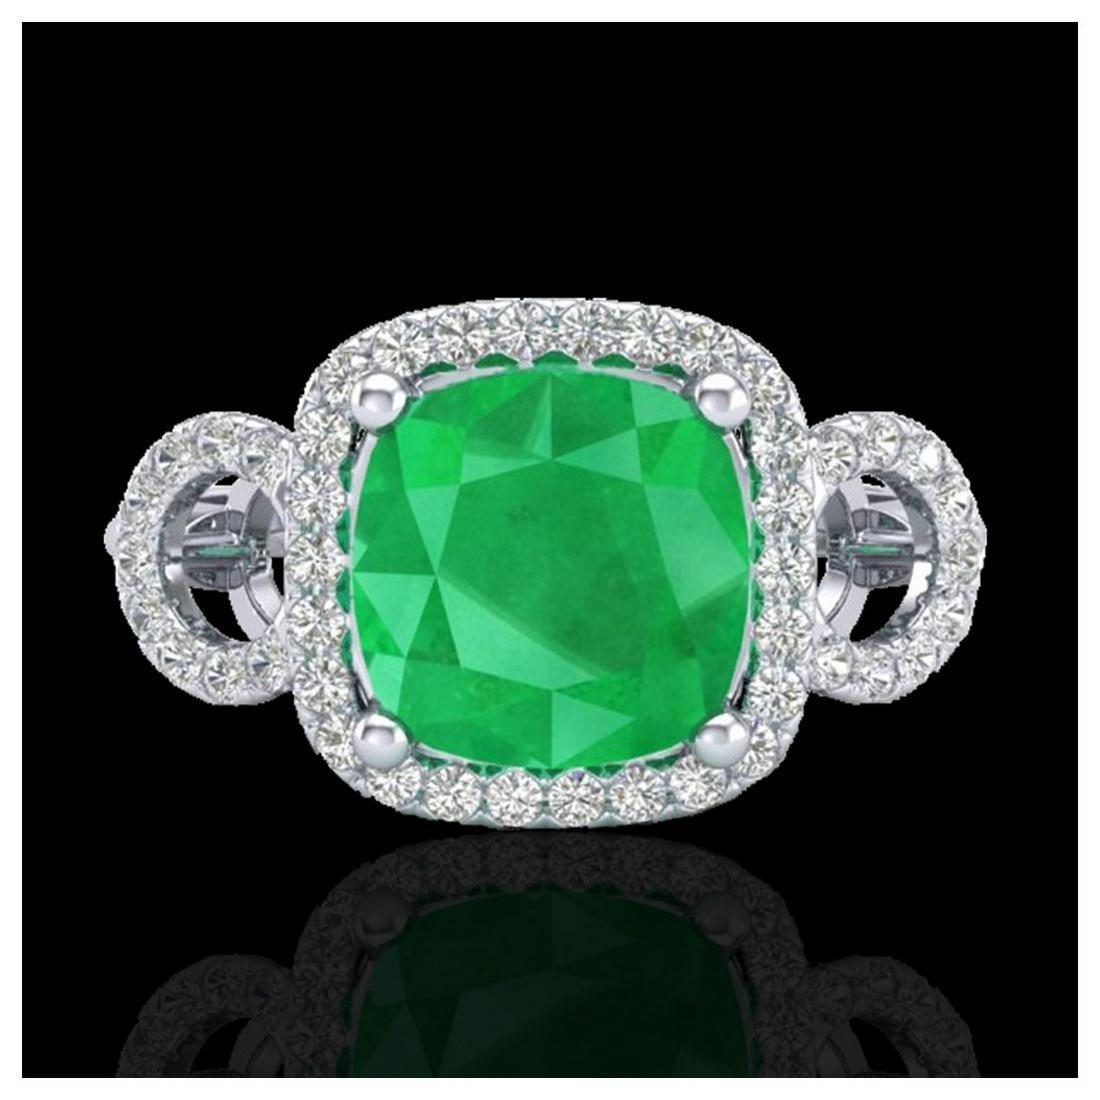 3.15 ctw Emerald & VS/SI Diamond Ring 18K White Gold -